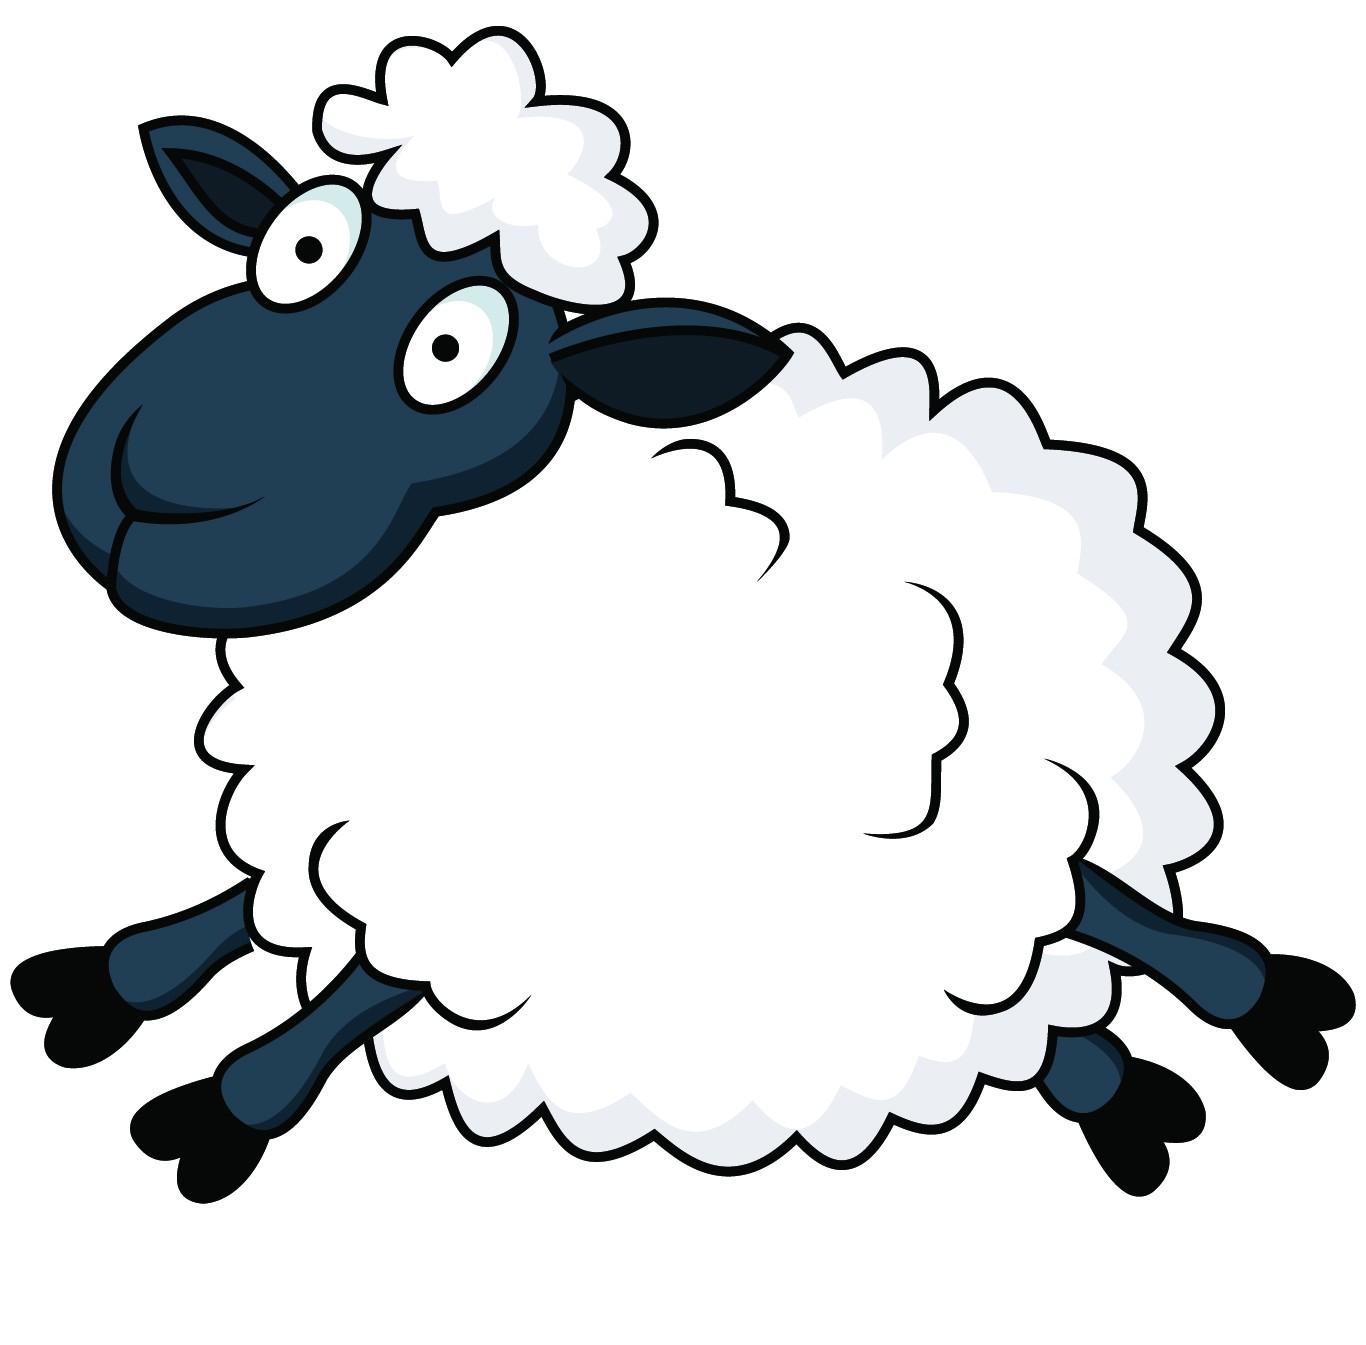 1366x1345 Cartoon Sheep Drawing Cartoon Sheep Pics Free Download Clip Art